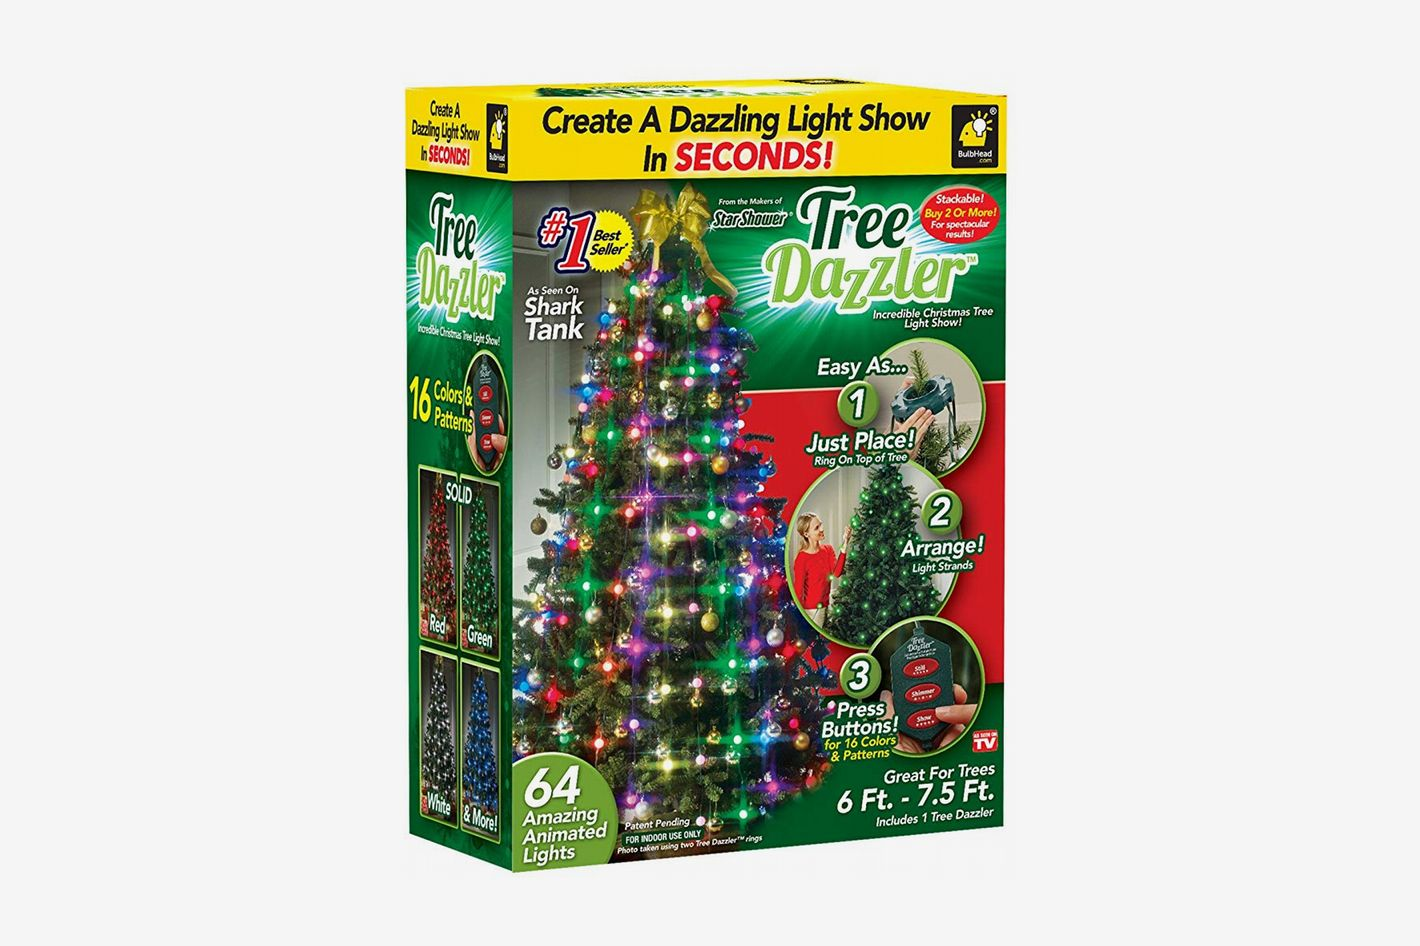 Star Shower Tree Dazzler LED Christmas Lights